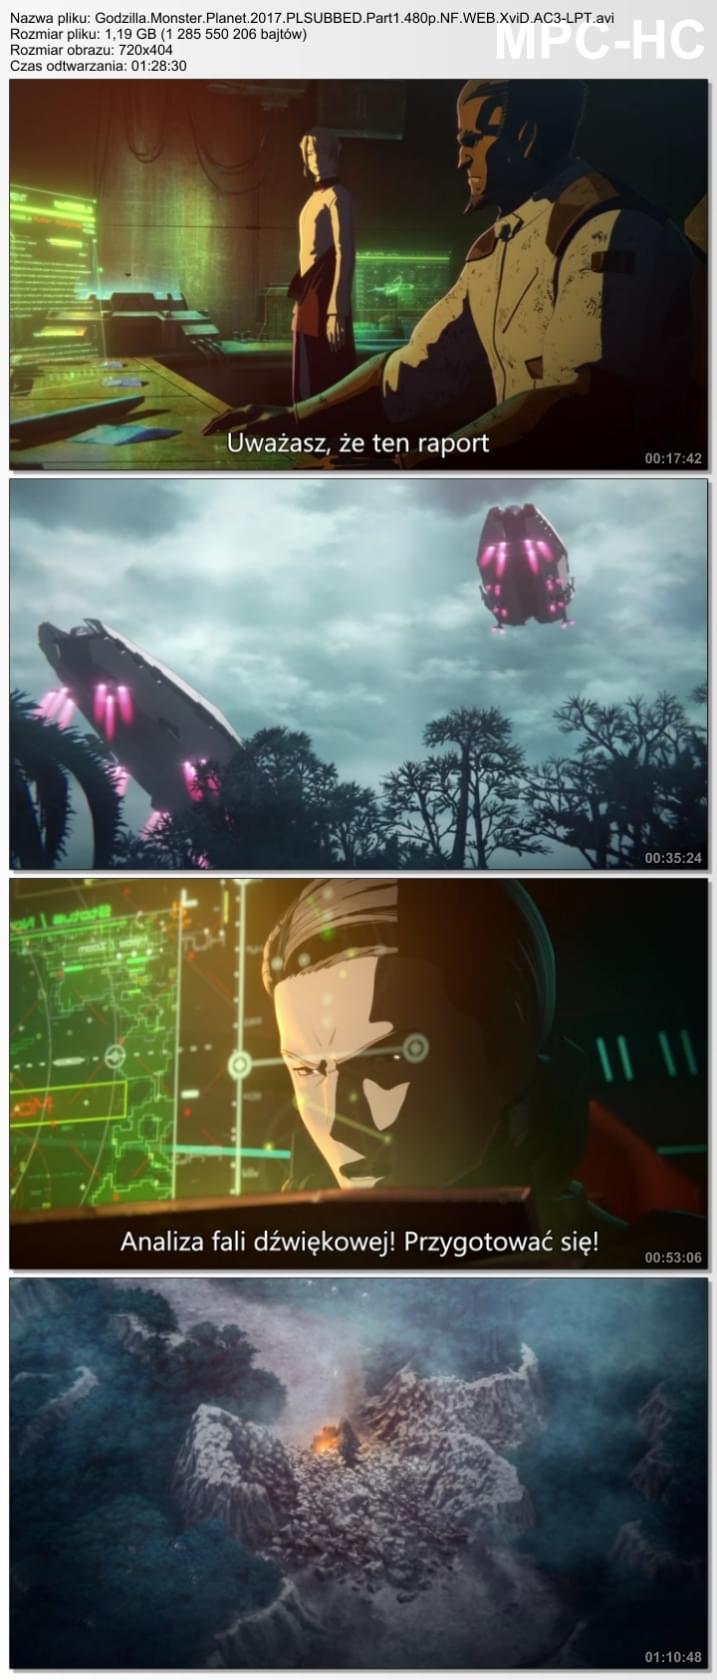 Godzilla: Planeta Potworów / Godzilla: Monster Planet - Part 1 (2017)